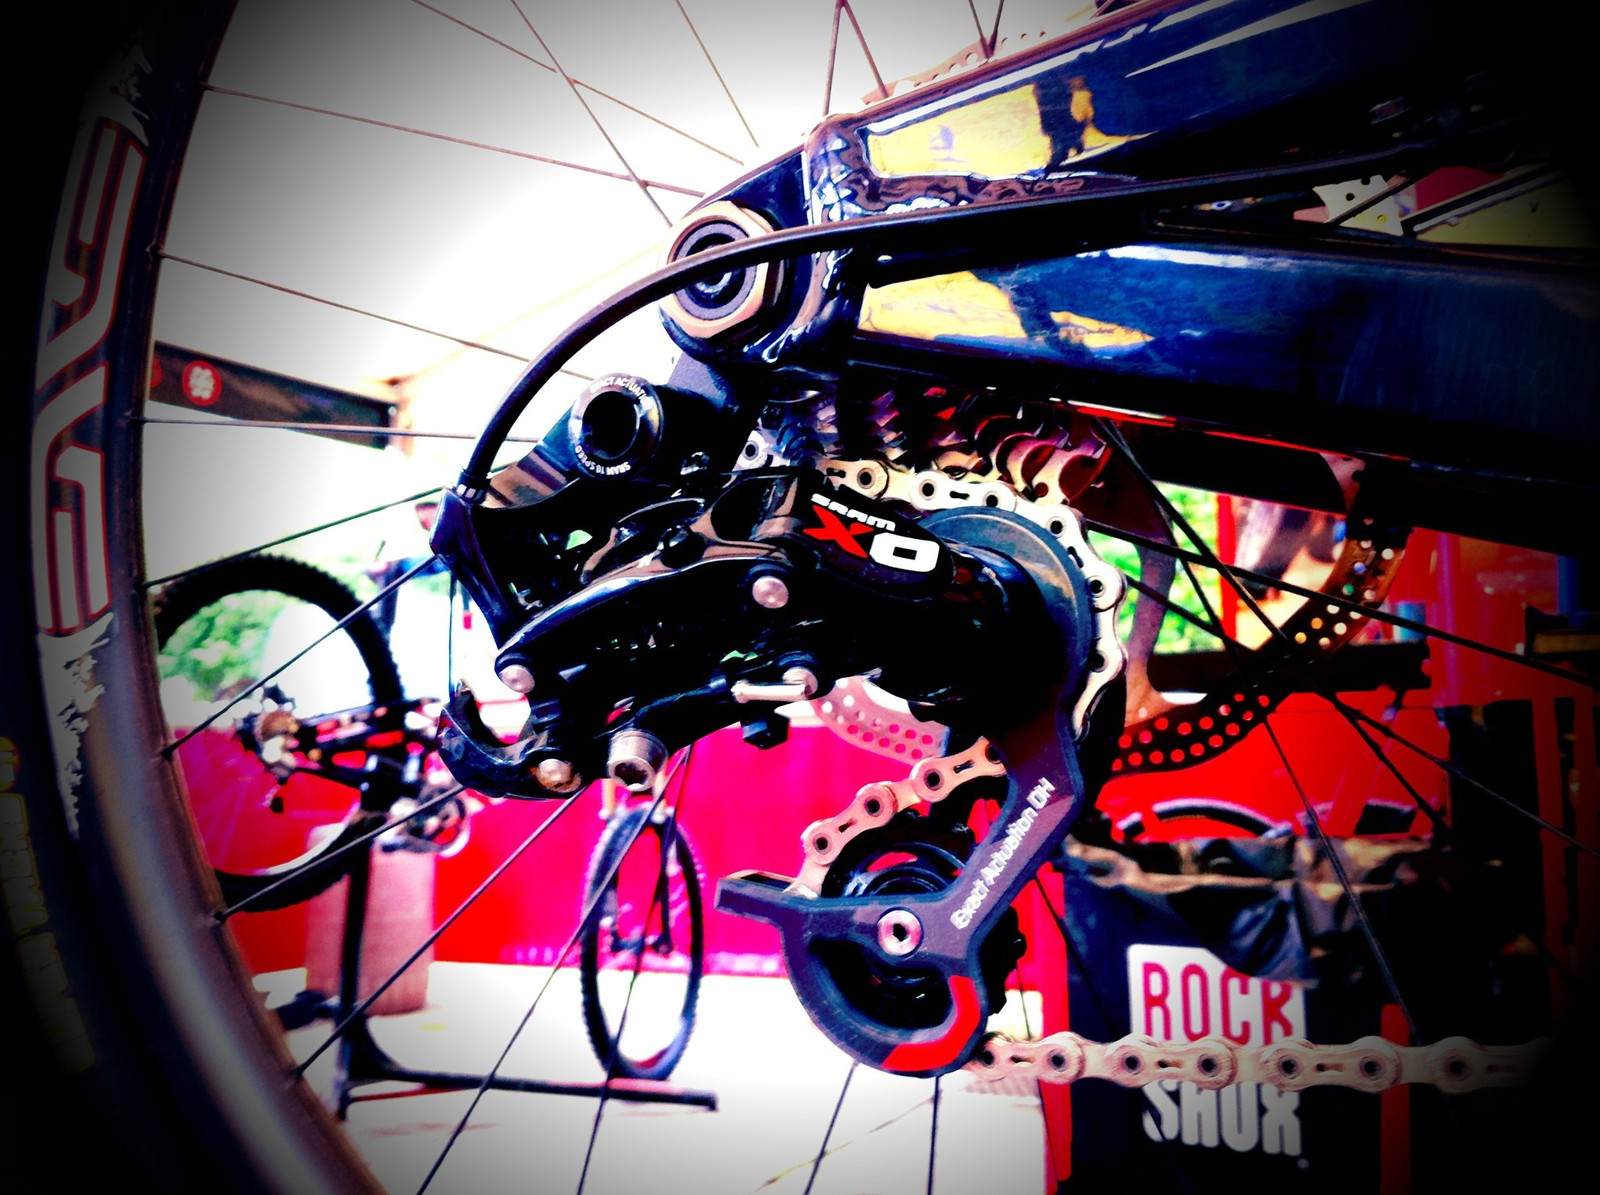 SRAM X0 DH Derailleur  - 2012 Prototypes and Sneak Peaks - Mountain Biking Pictures - Vital MTB